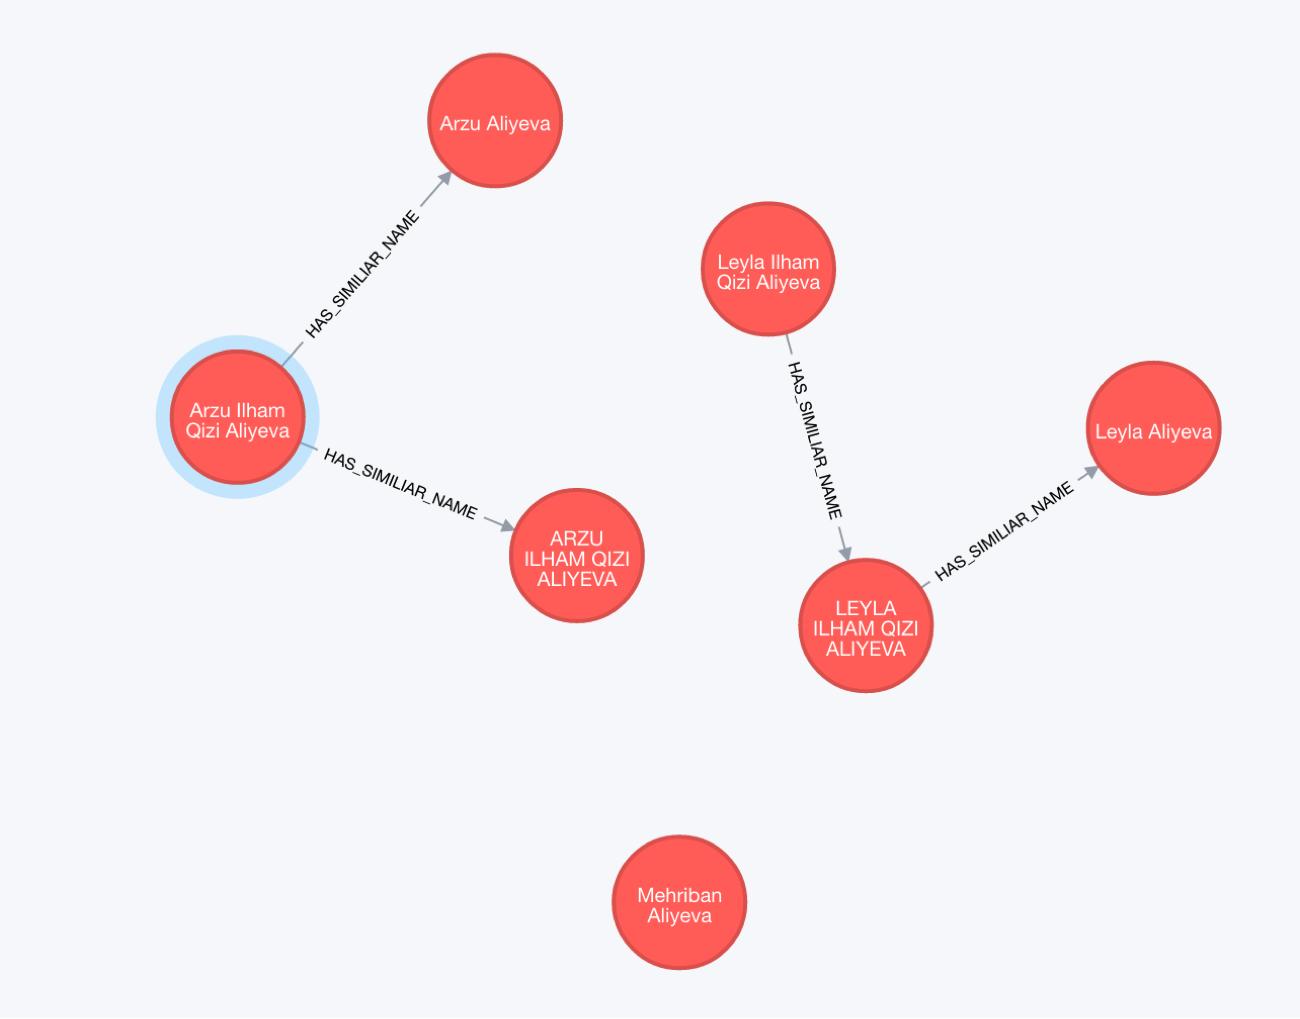 Family Ties by Last Name in the Azerjaiban Data